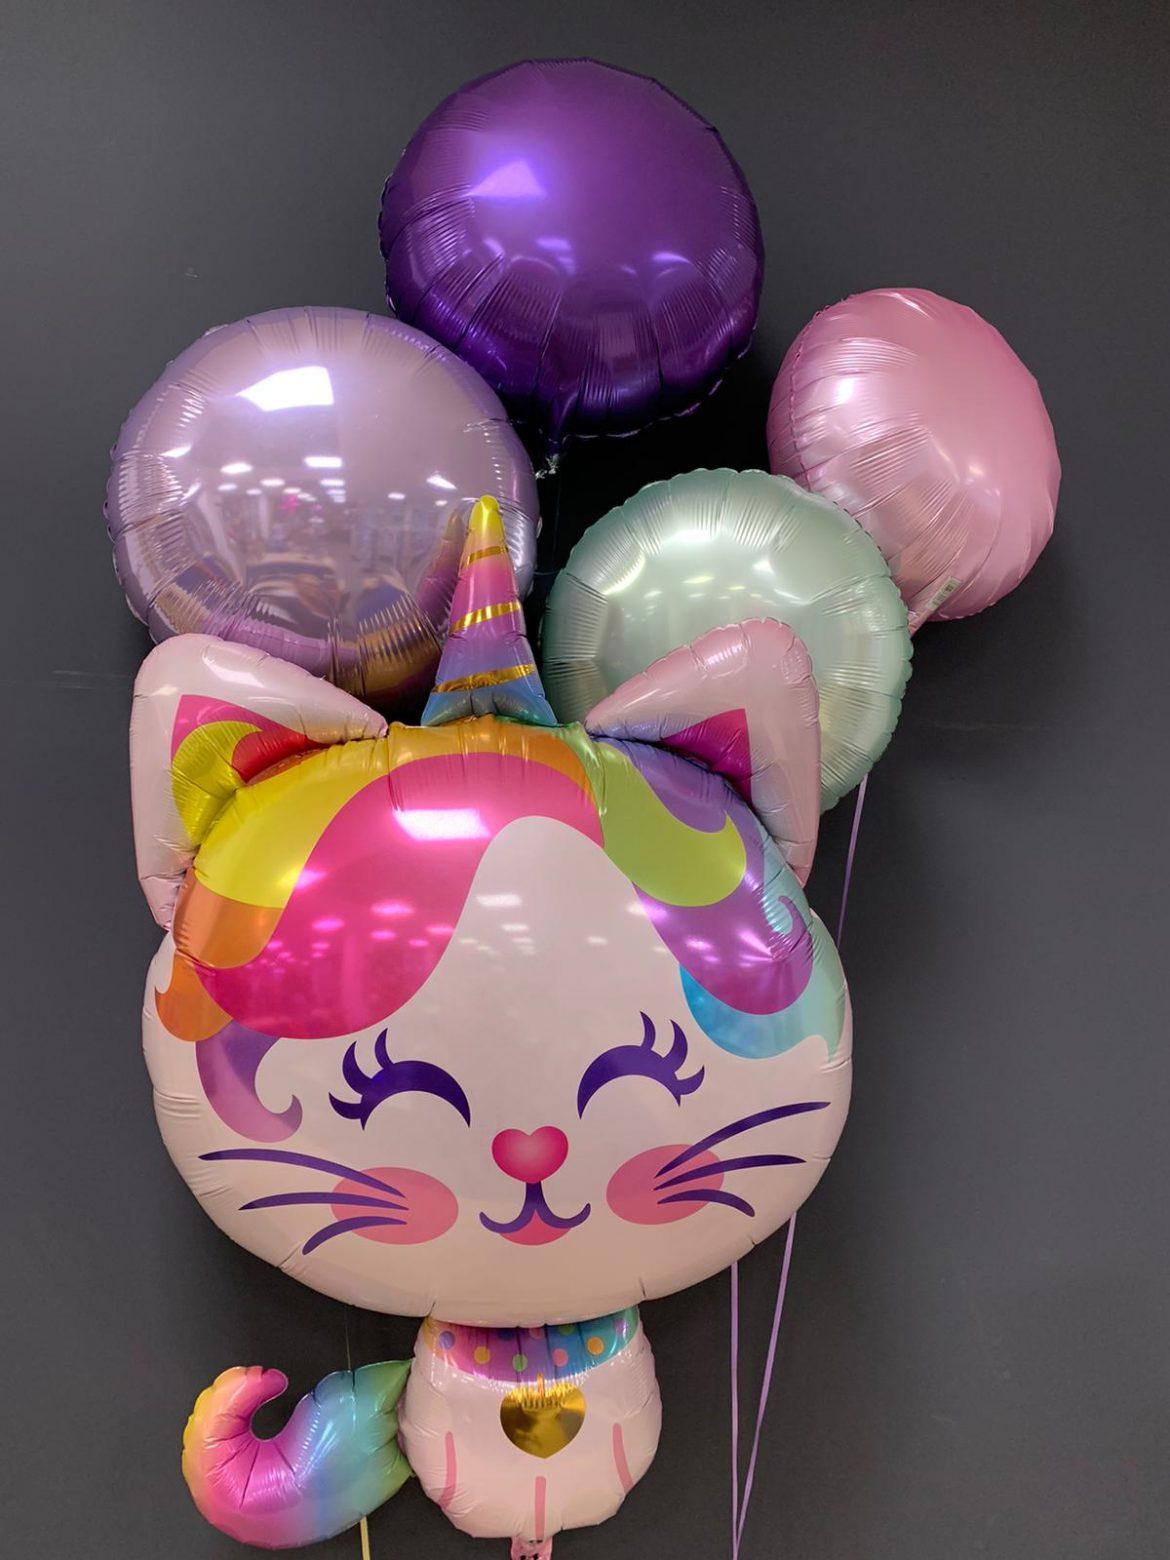 Einhorn-Katze Ballon € 8,90 Dekoballons je € 4,50 1